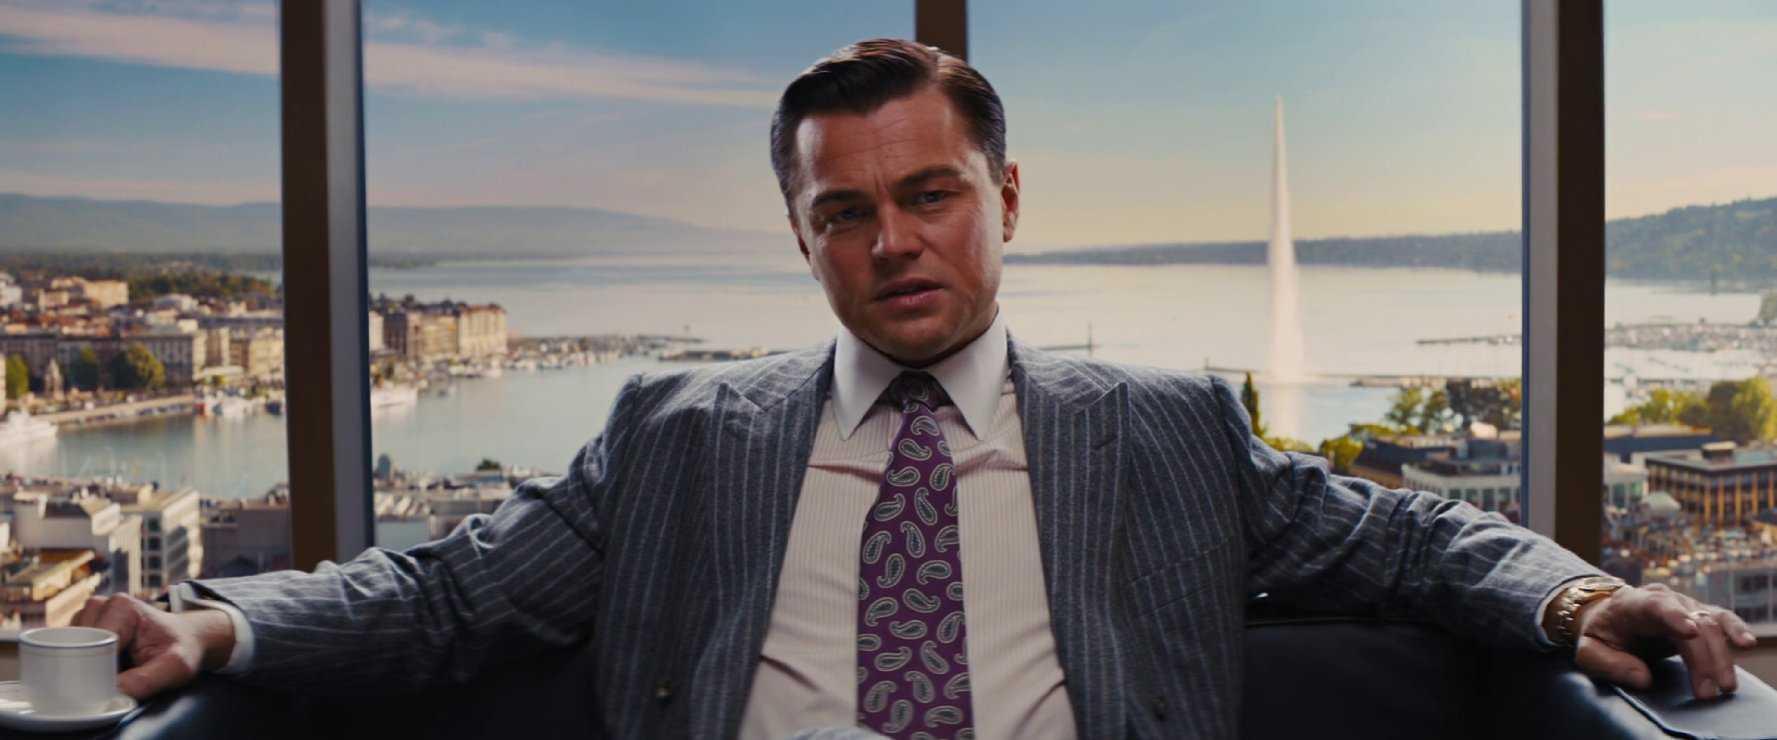 Paramount Wins Bid For Da Vinci Biopic Starring Leonardo DiCaprio | leonardo dicaprio